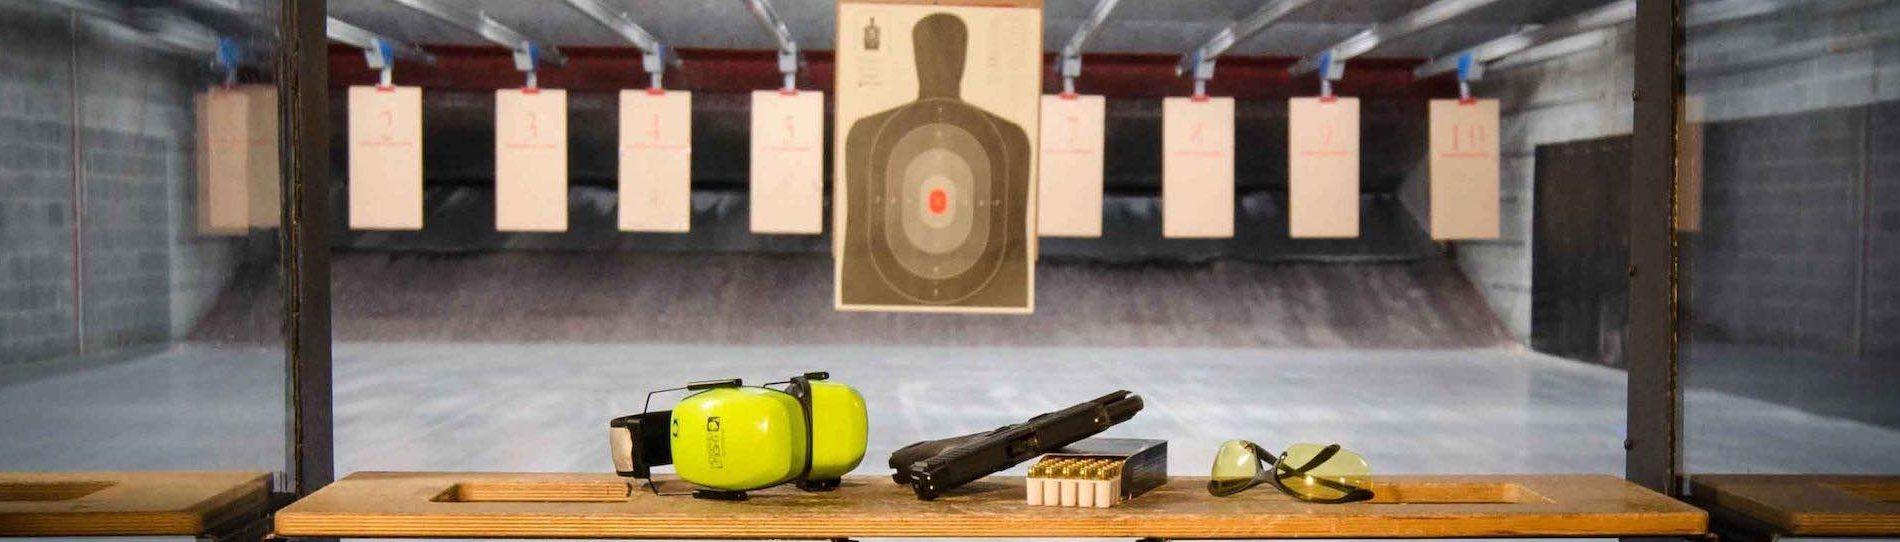 group of bucks at shooting range